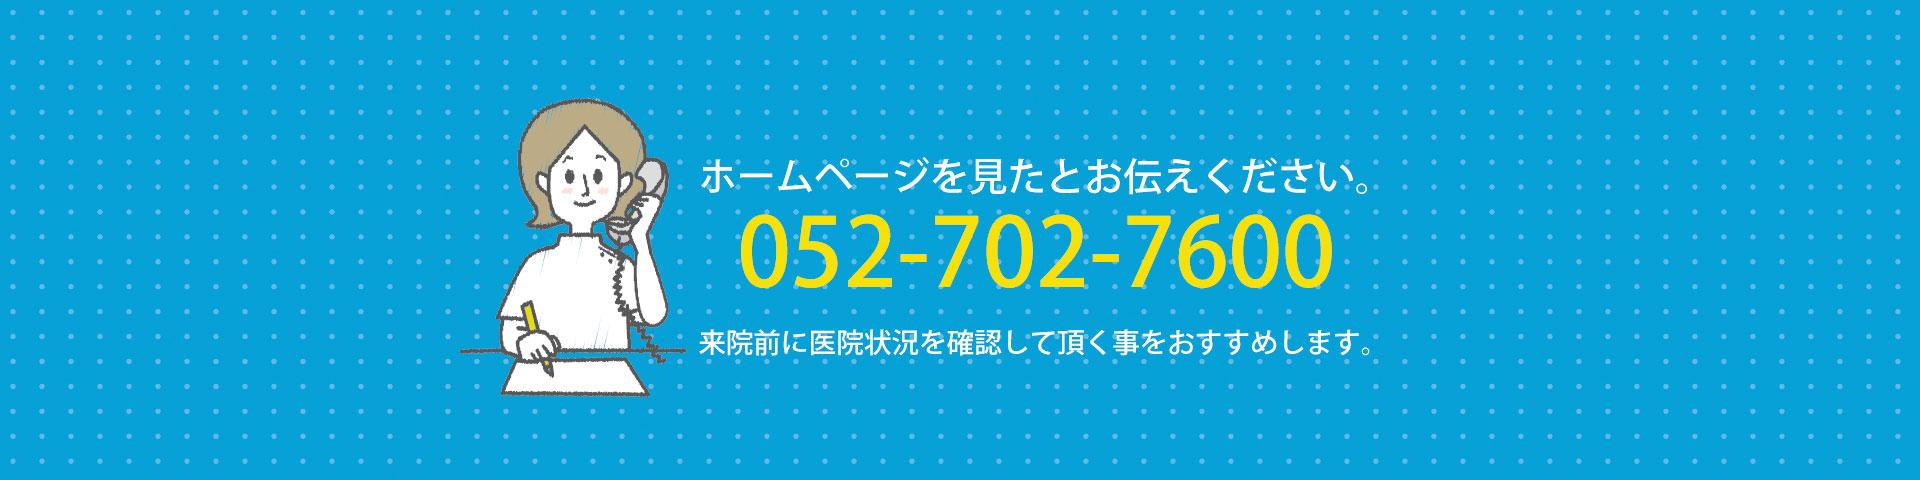 052−702−7600